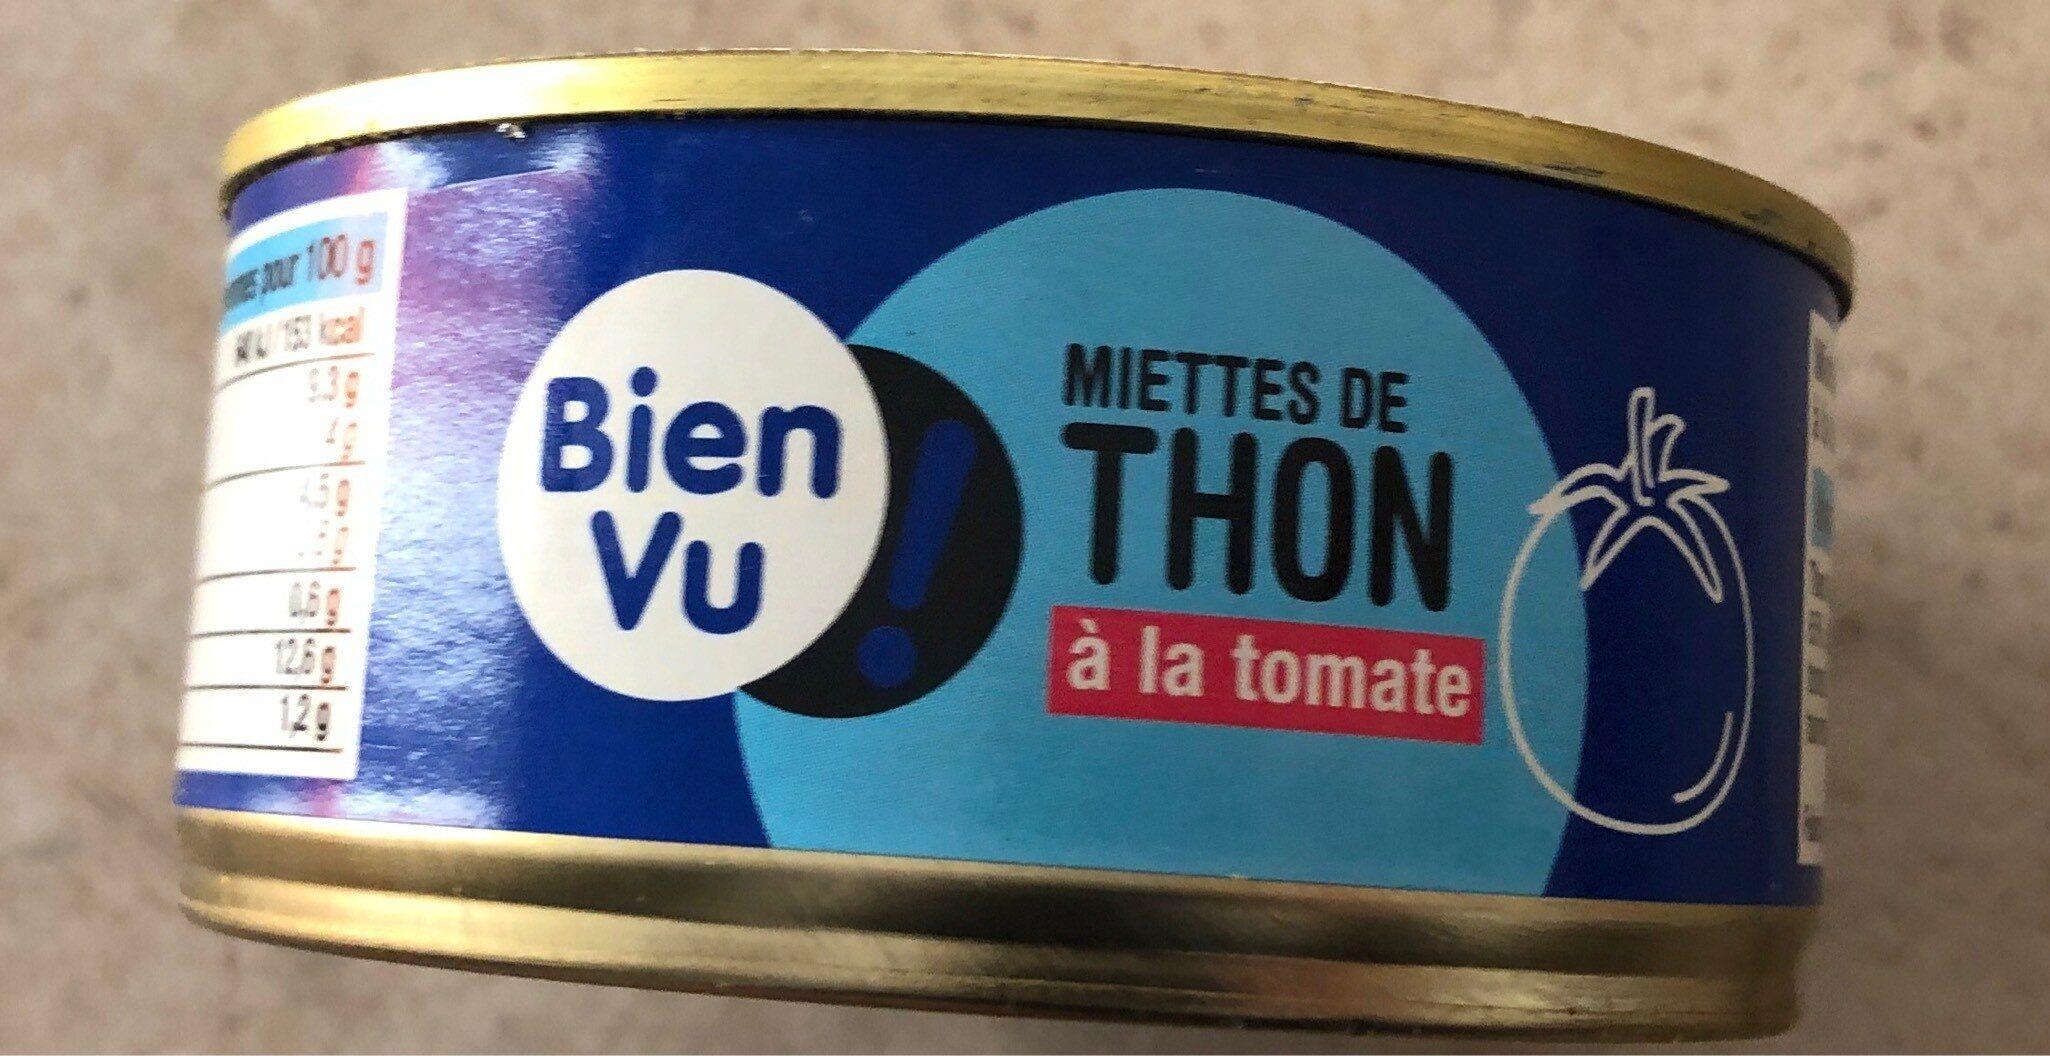 Miettes de thon a la tomate BIEN VU - Valori nutrizionali - fr